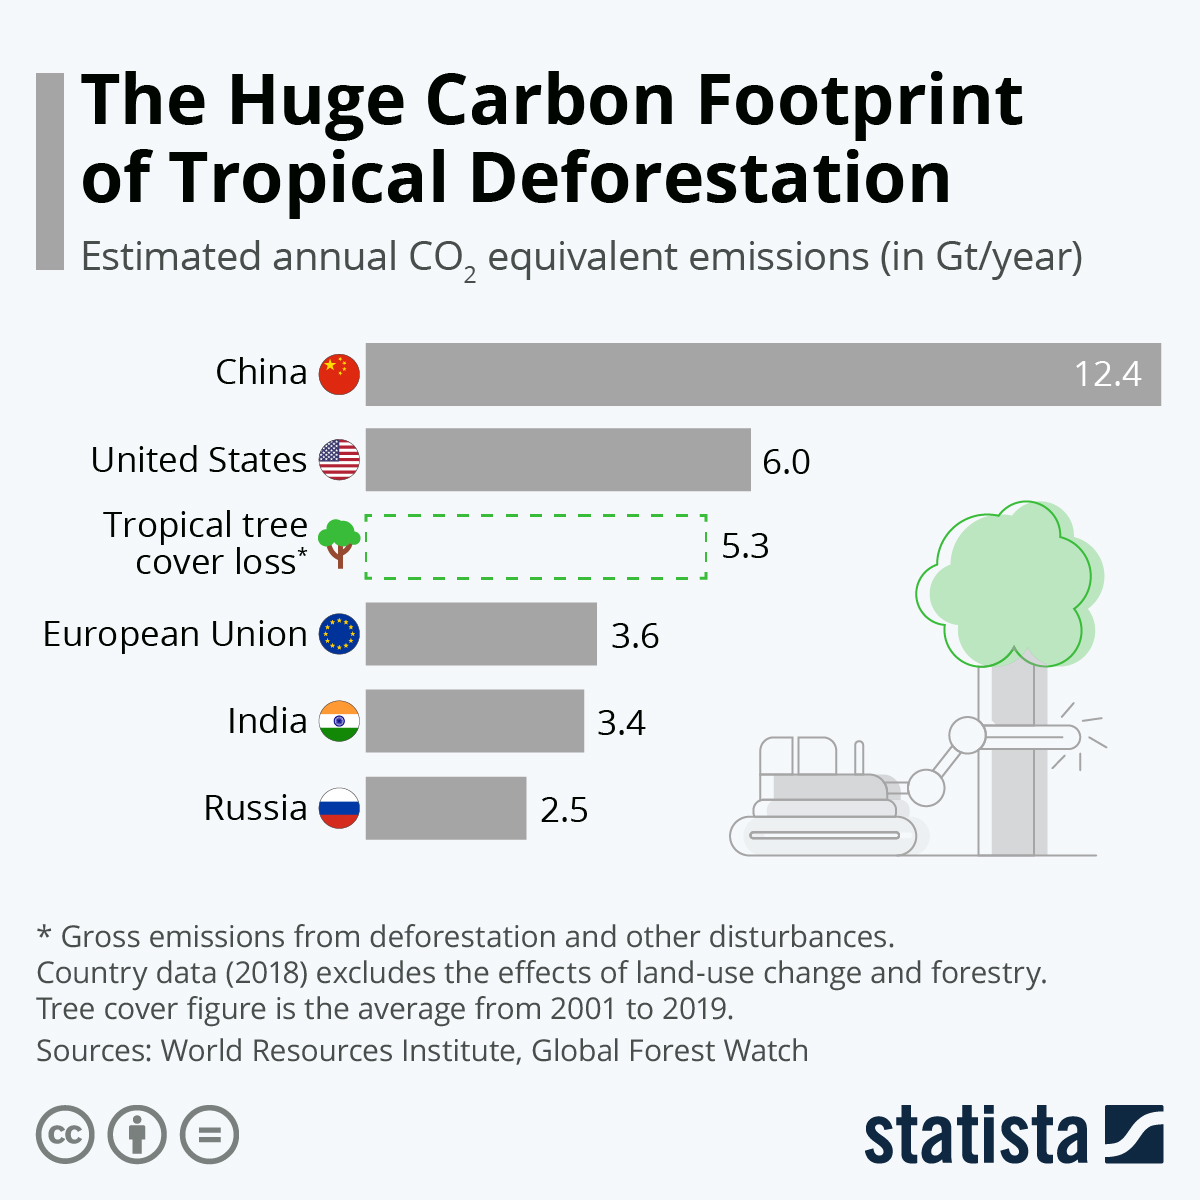 Tropical deforestation has a massive carbon footprint